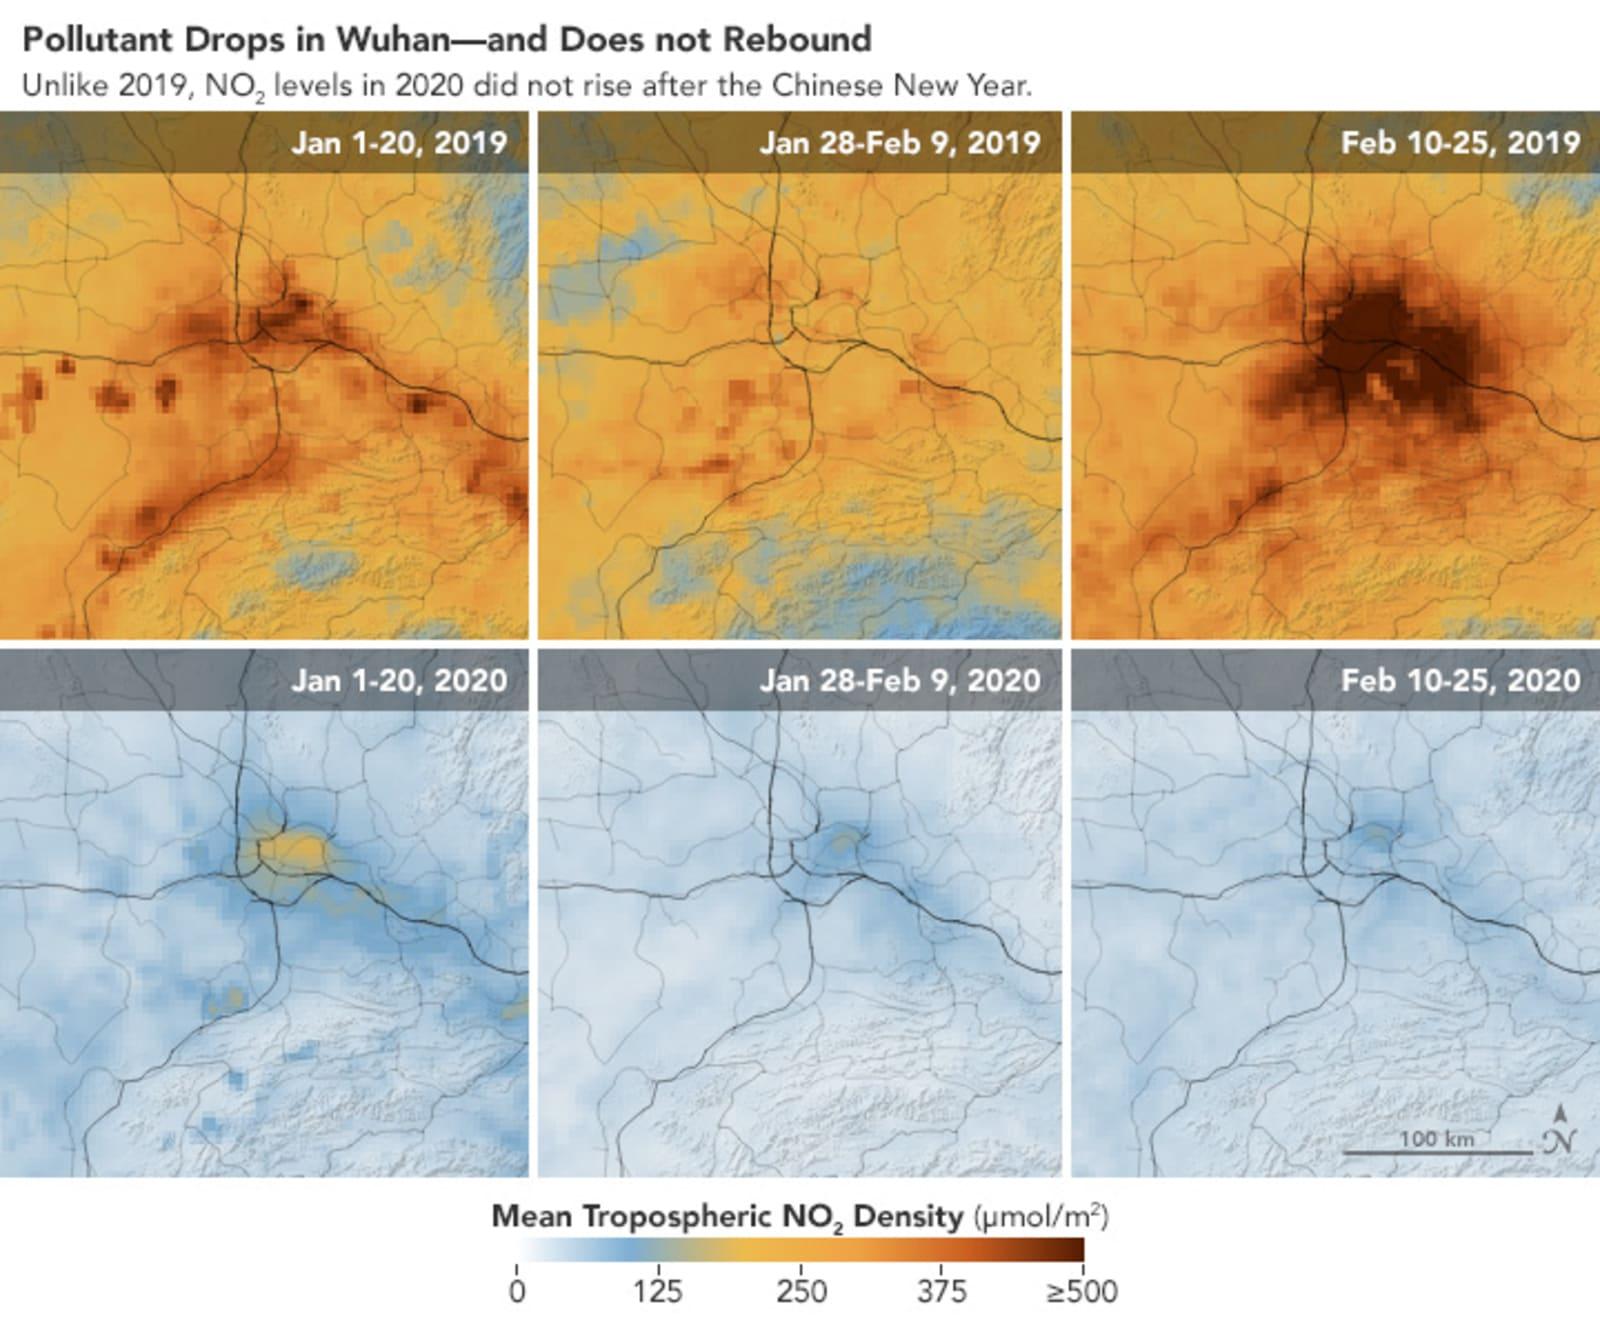 Wuhan pollution level drop over coronavirus